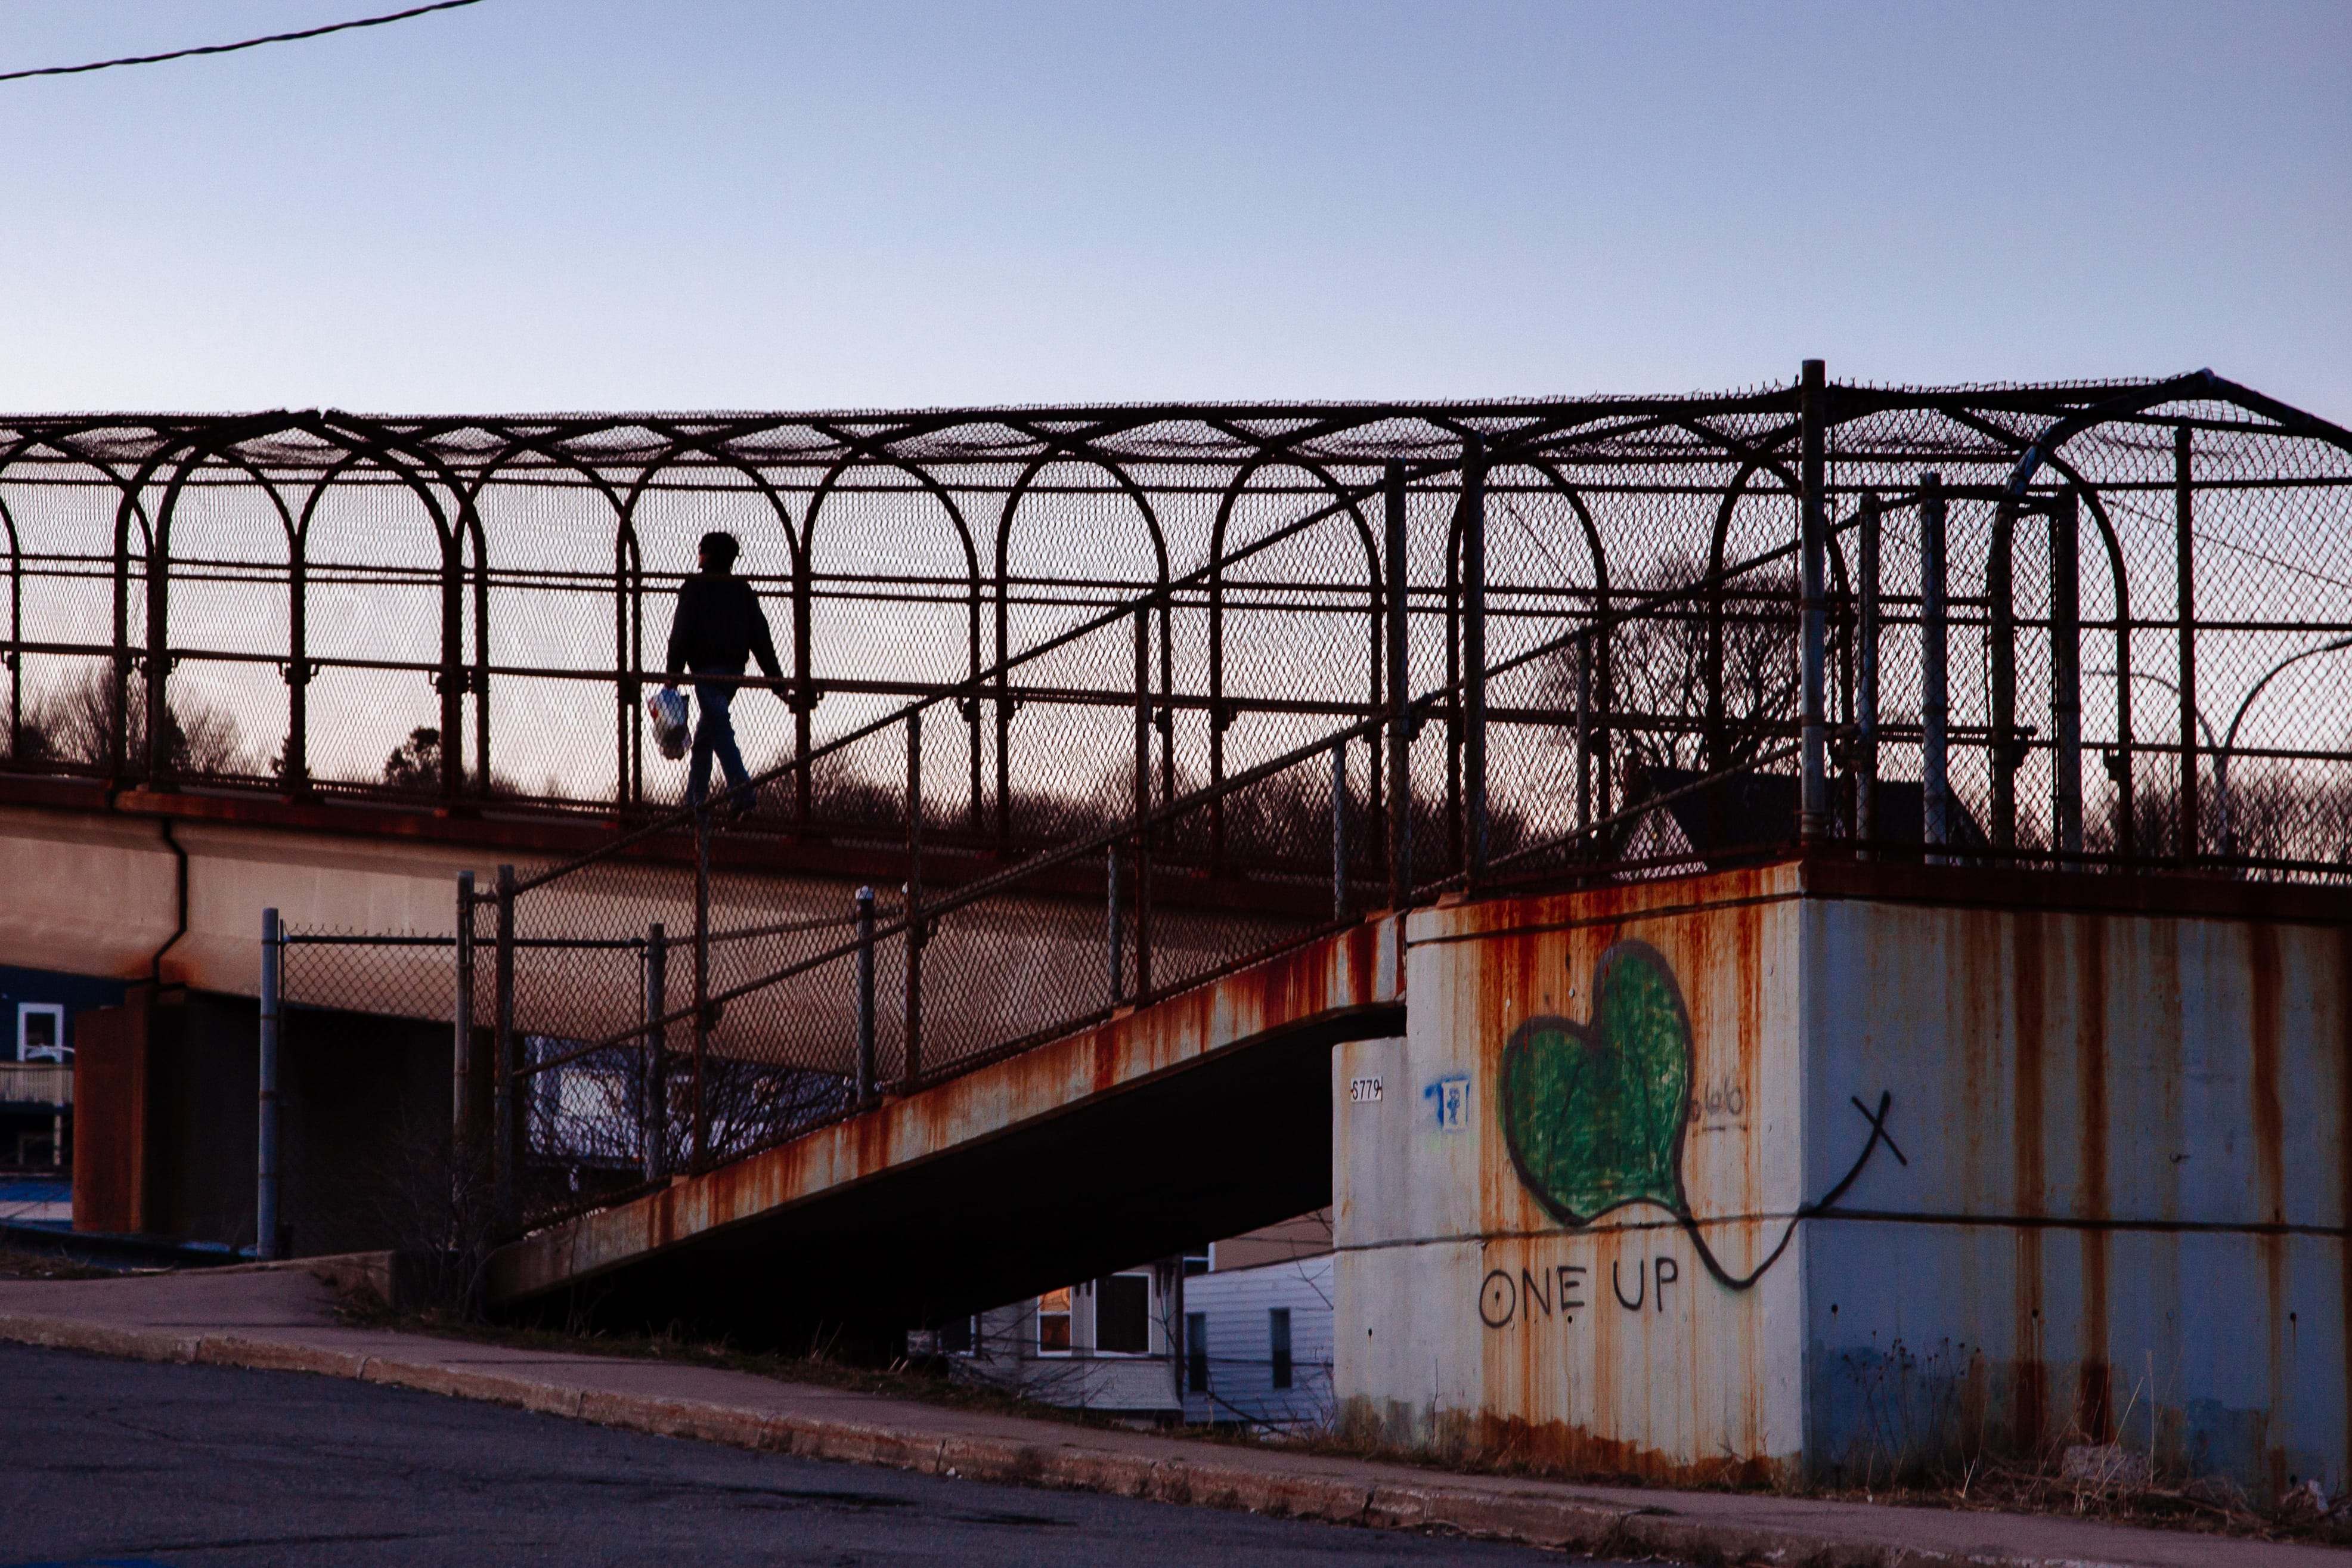 A photograph depicting Highway Overpass Saint John